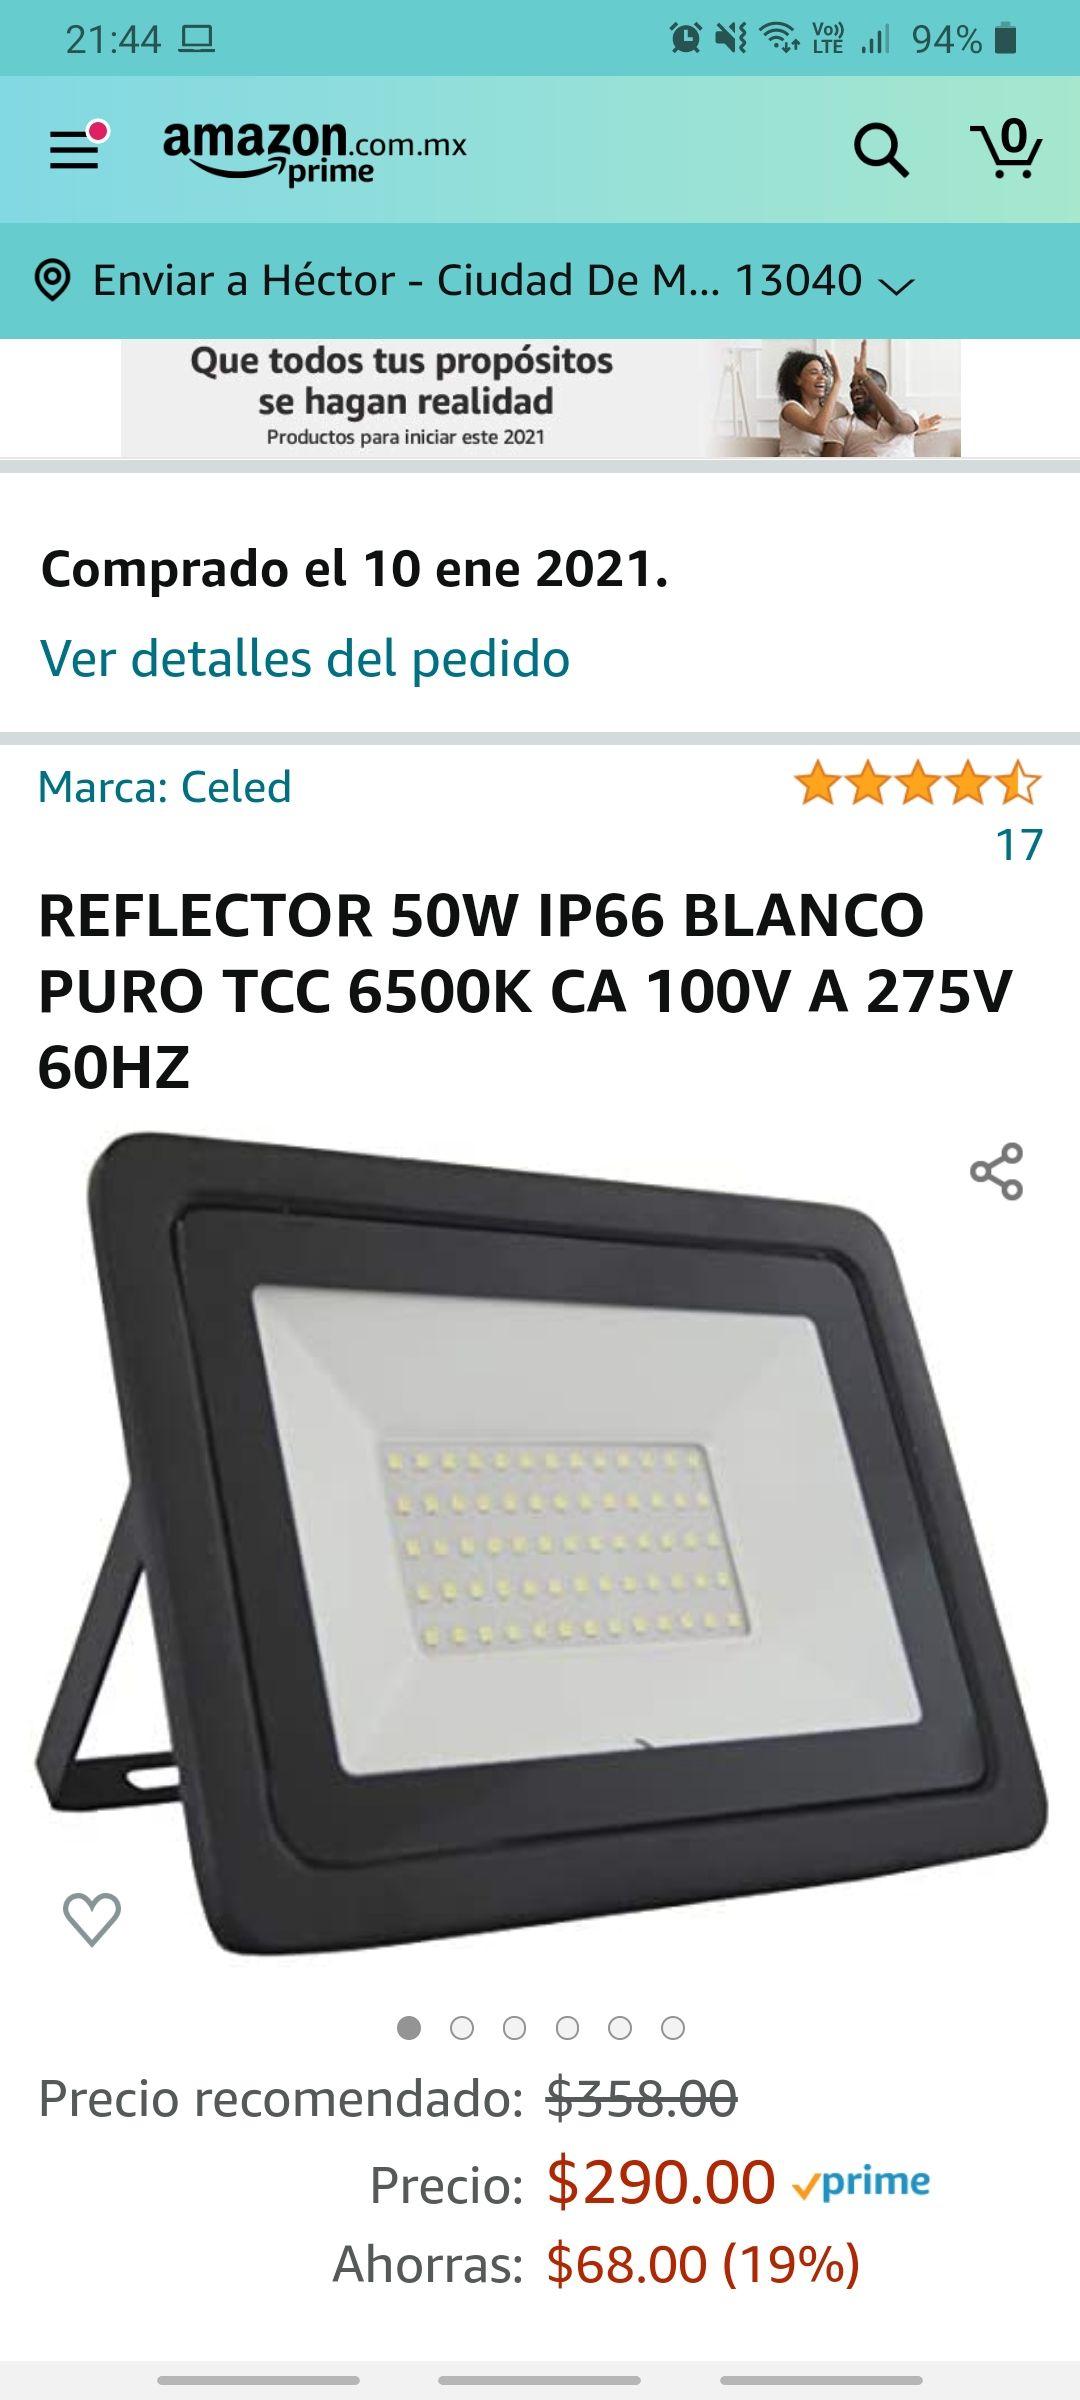 Amazon: REFLECTOR 50W IP66 BLANCO PURO TCC 6500K CA 100V A 275V 60HZ